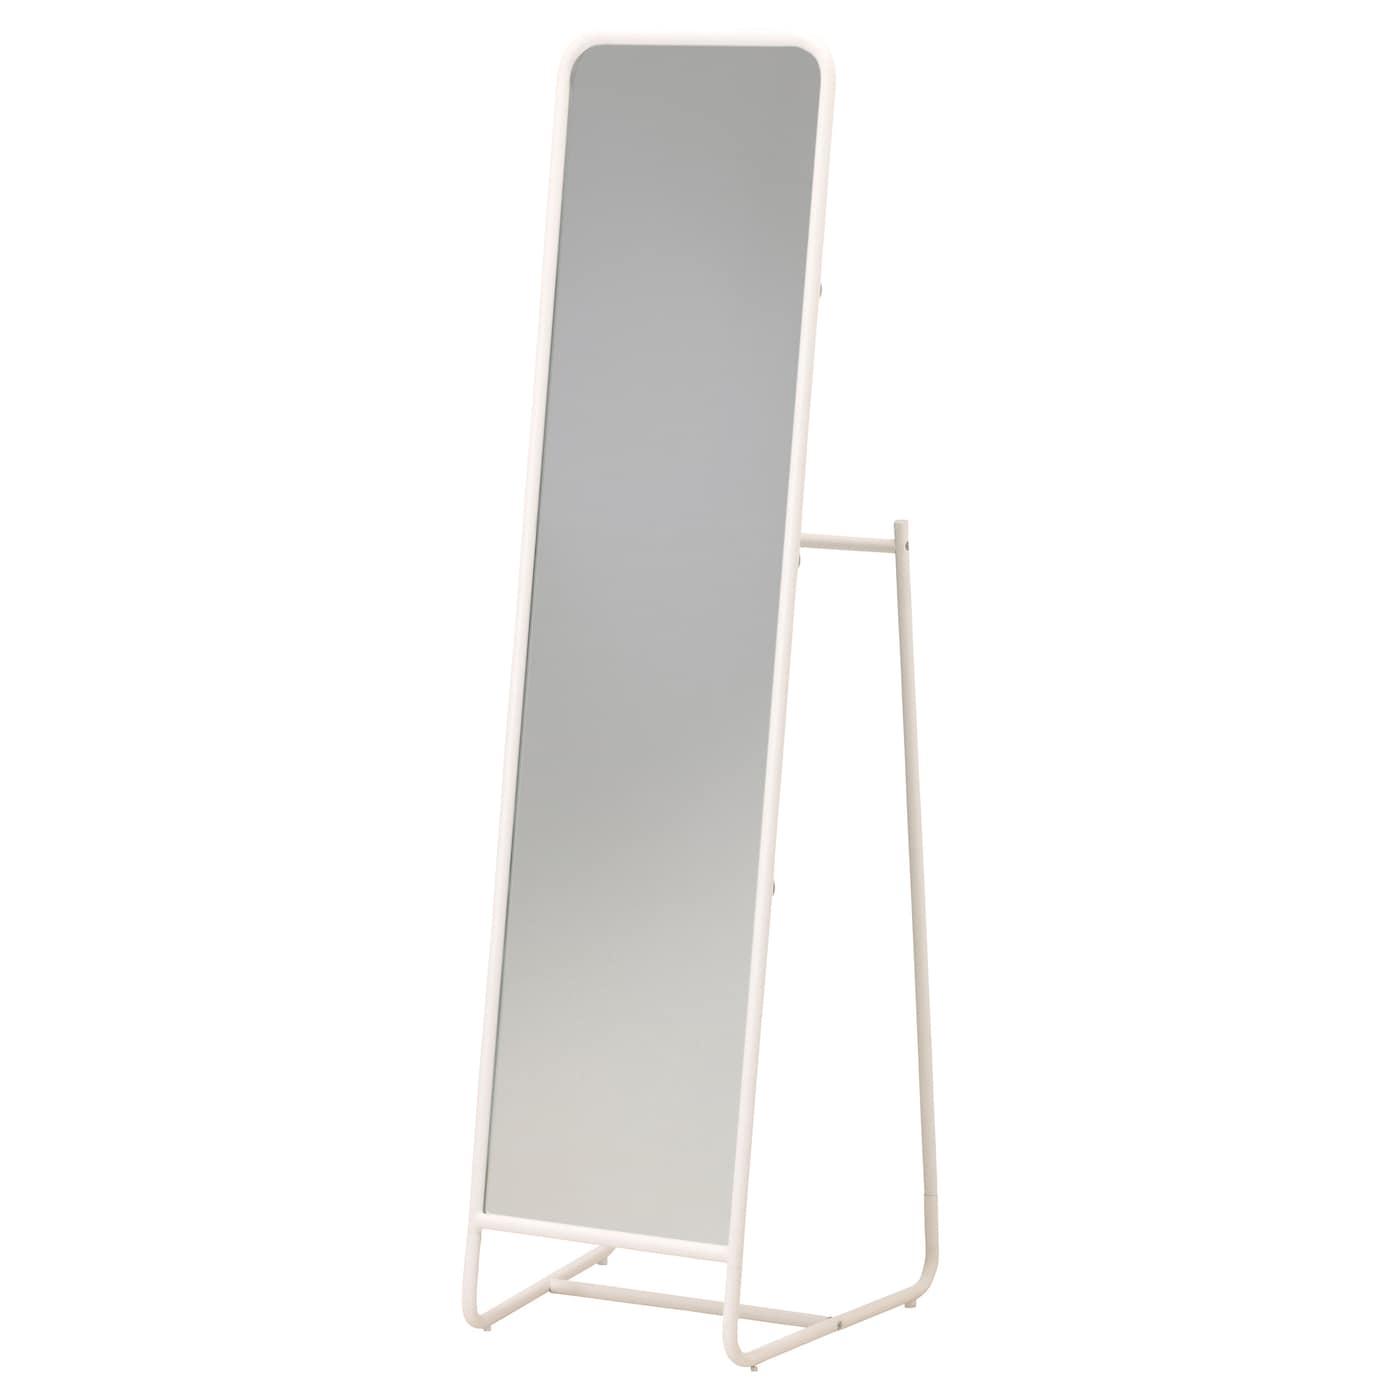 Bathroom mirrors ikea ireland dublin for Ikea minde mirror